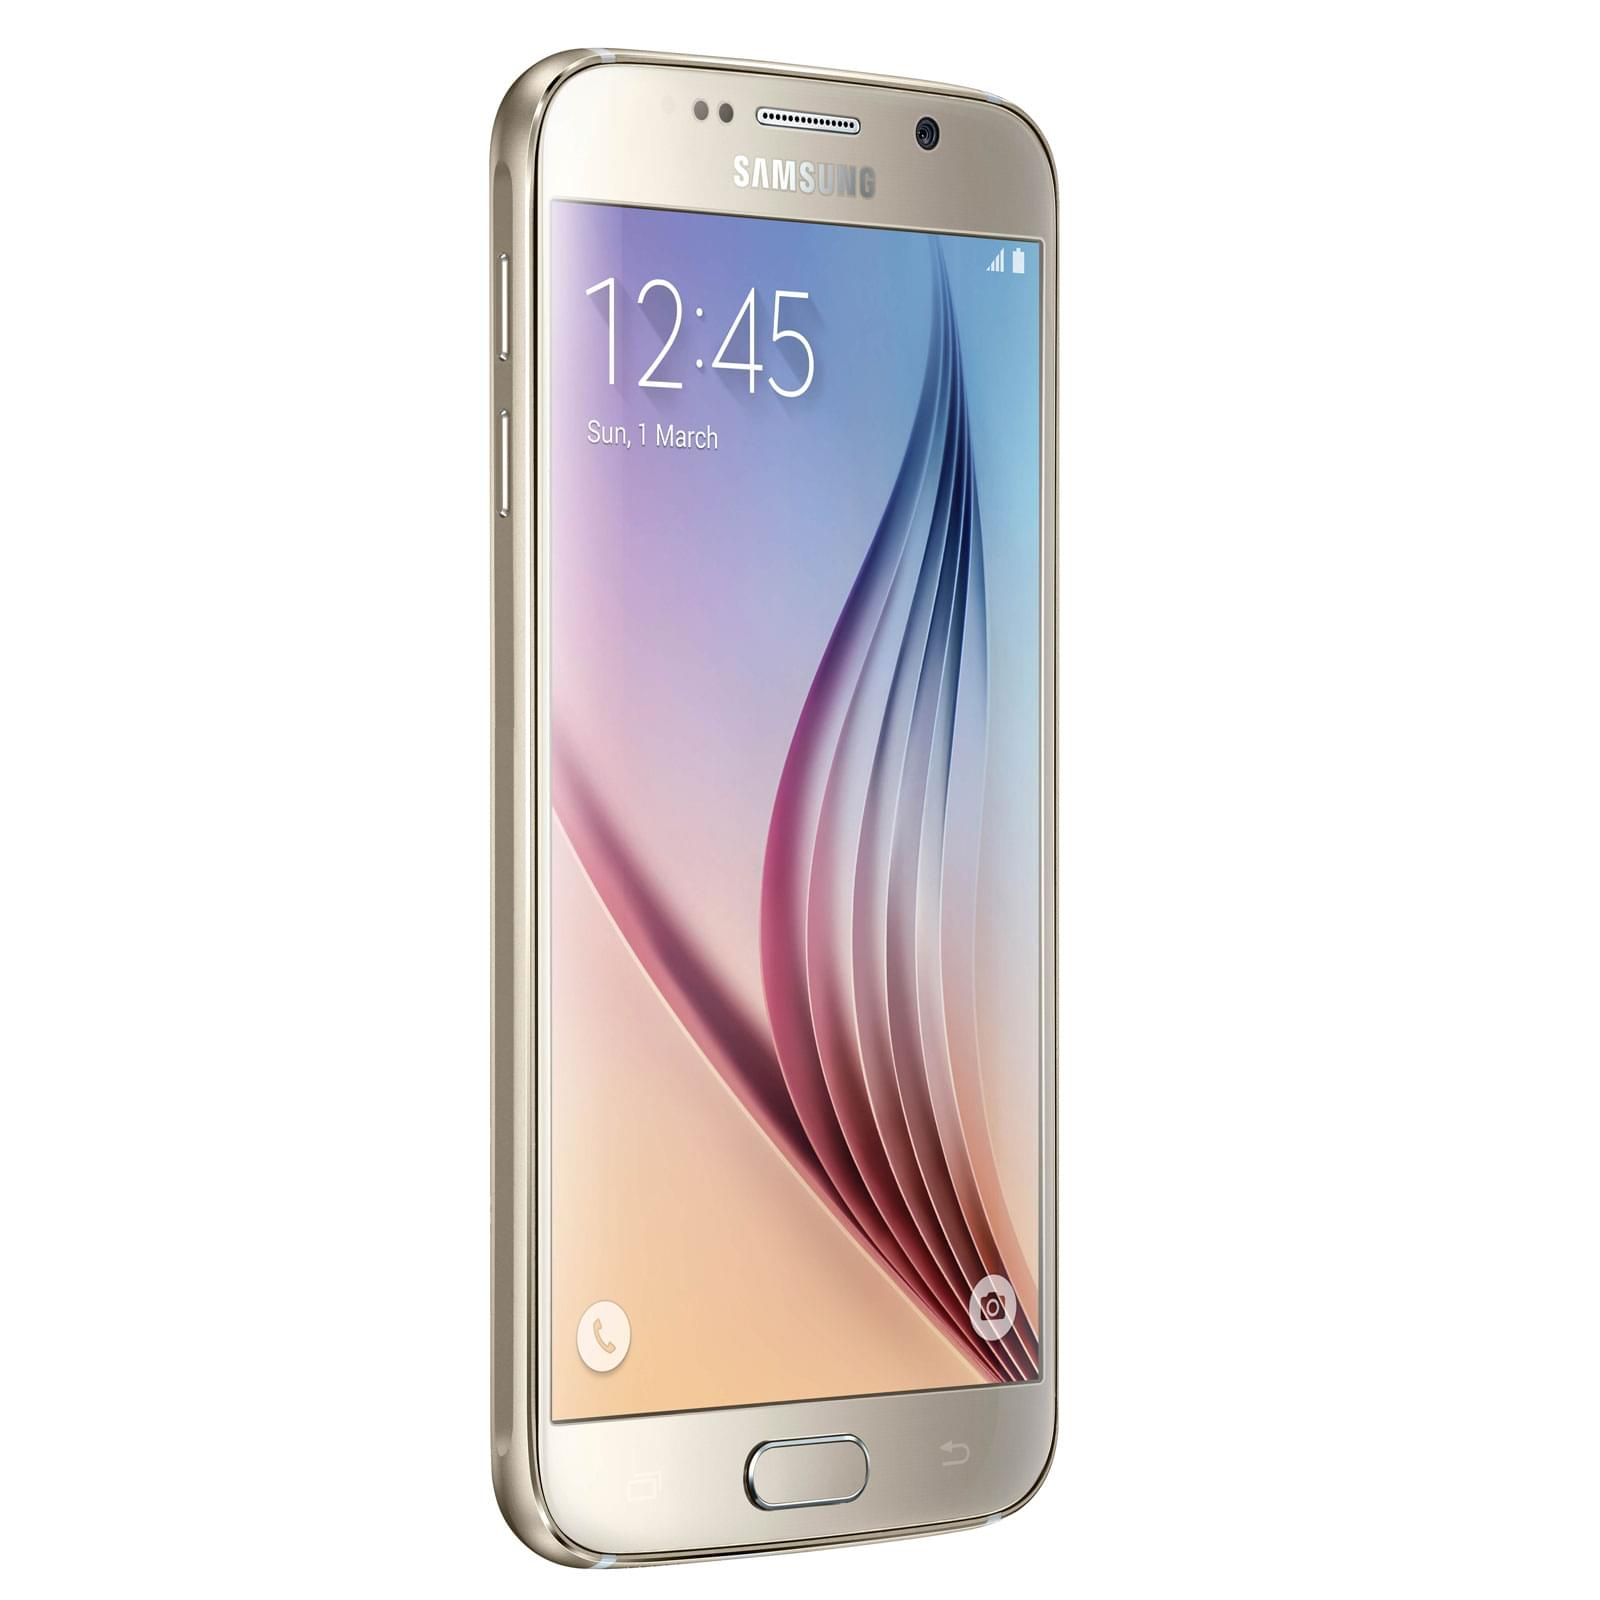 Samsung Galaxy S6 32Gb Gold G920F (SM-G920FZDAXEF) - Achat / Vente Téléphonie sur Cybertek.fr - 0